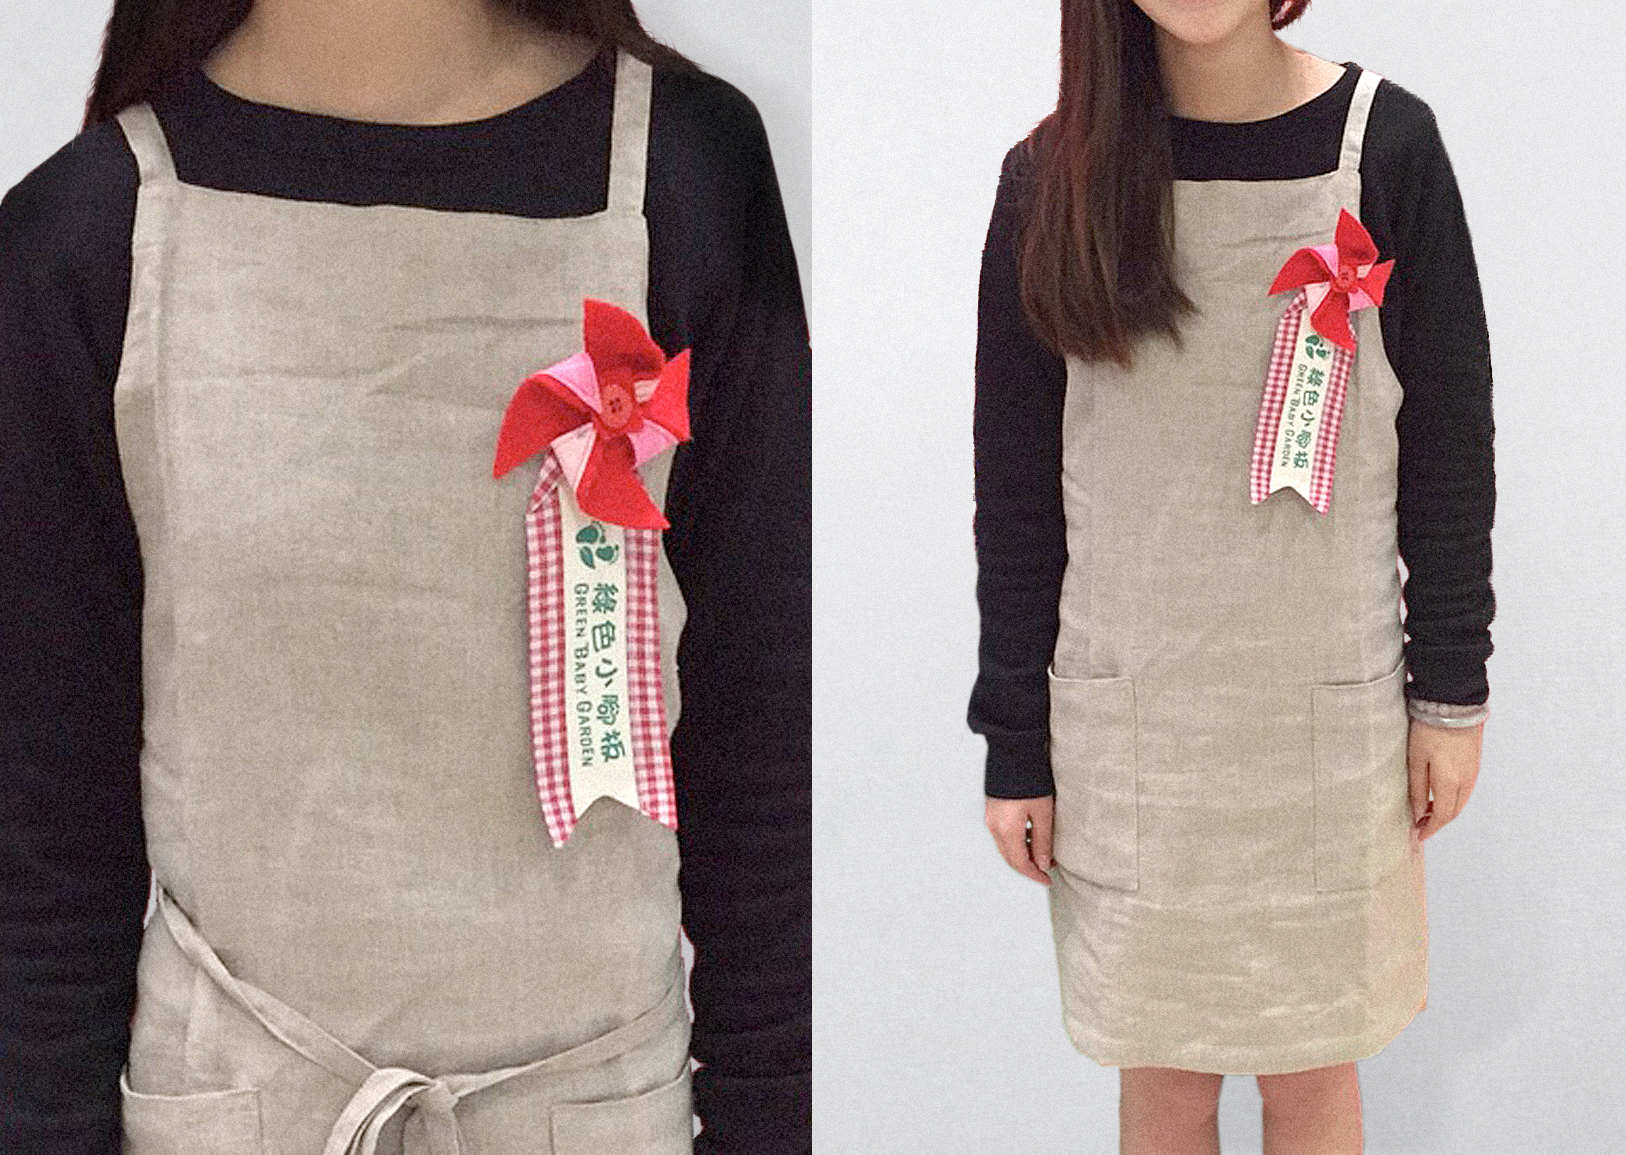 Green Baby Garden :: Uniform Design